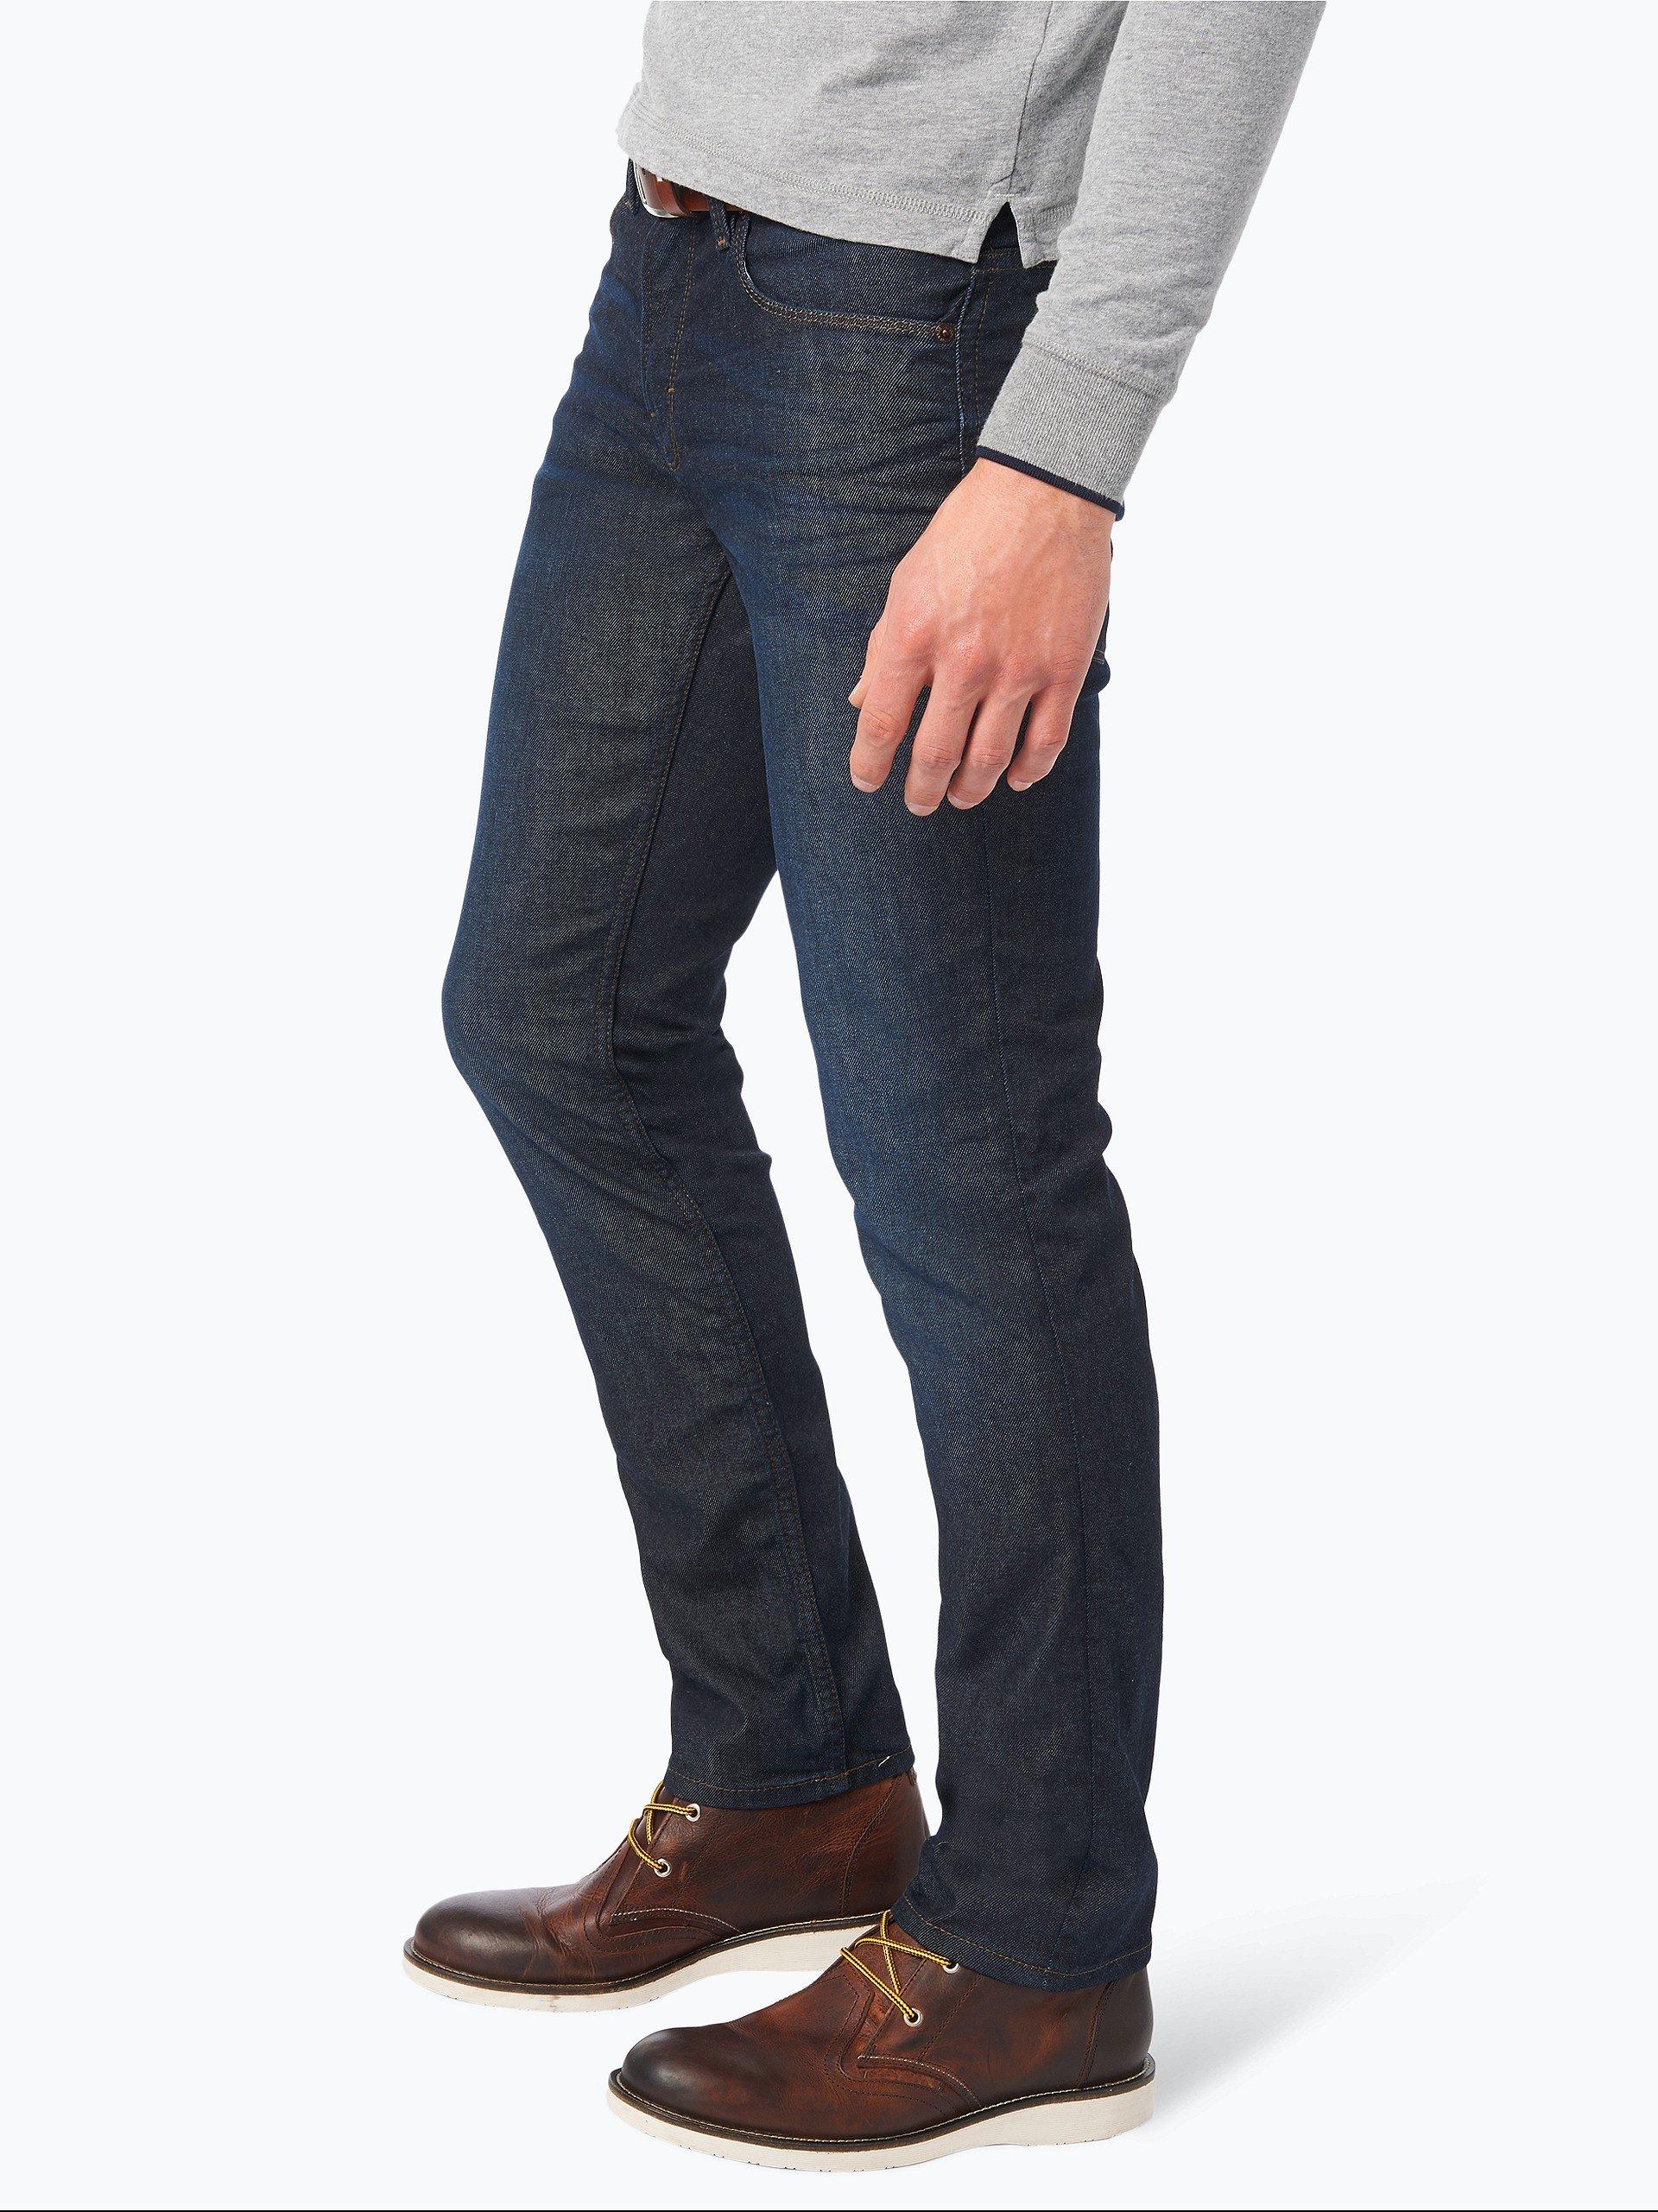 boss orange herren jeans orange 63 dark stone uni online kaufen vangraaf com. Black Bedroom Furniture Sets. Home Design Ideas